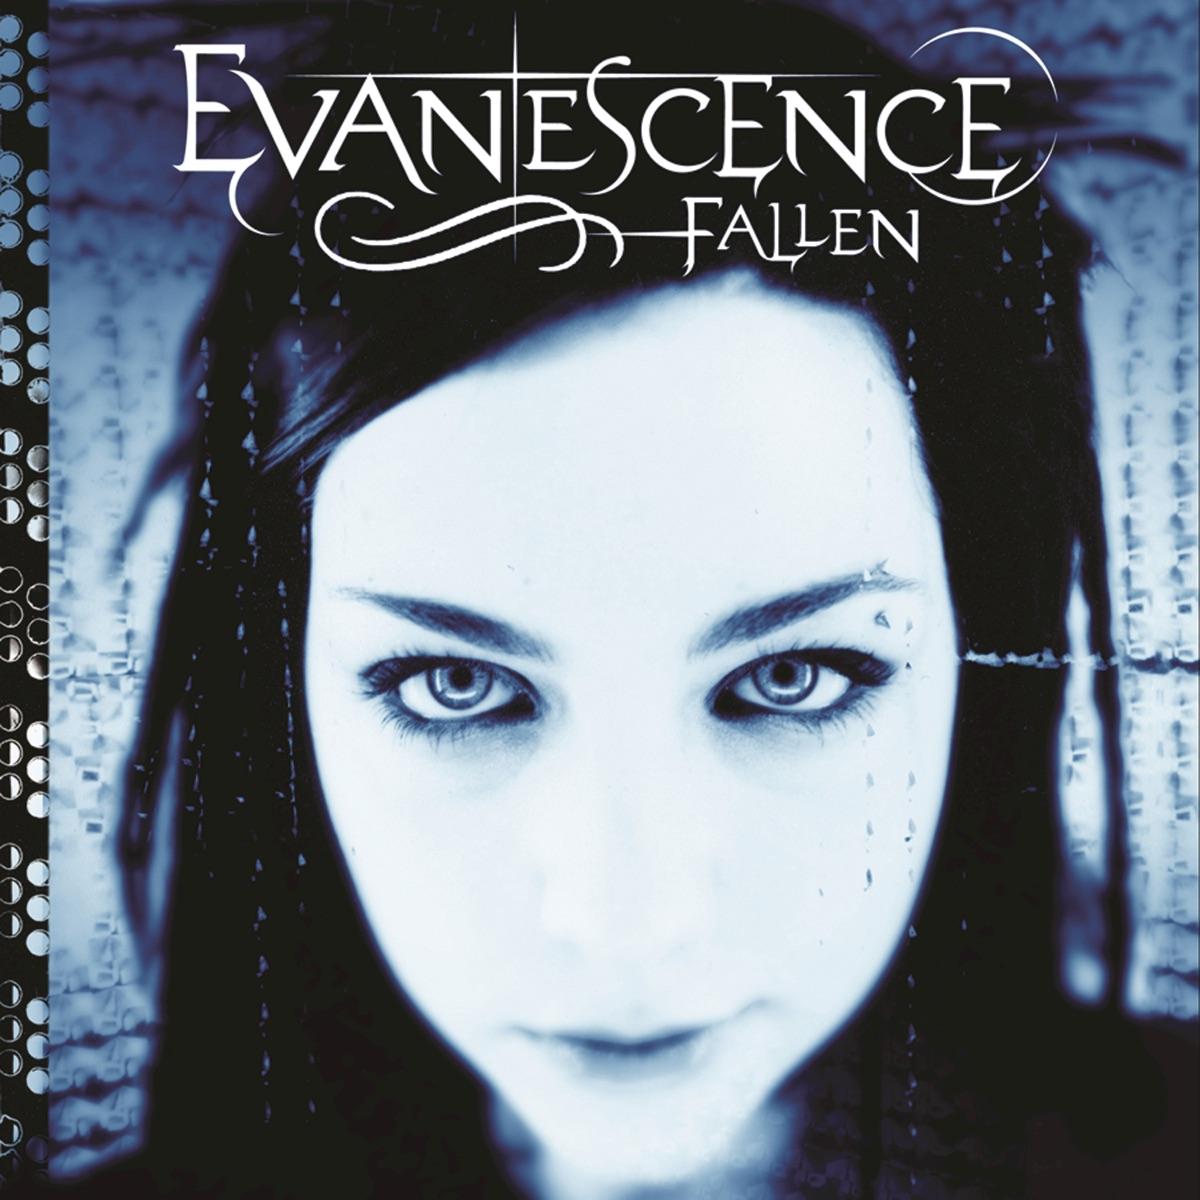 Fallen Evanescence CD cover